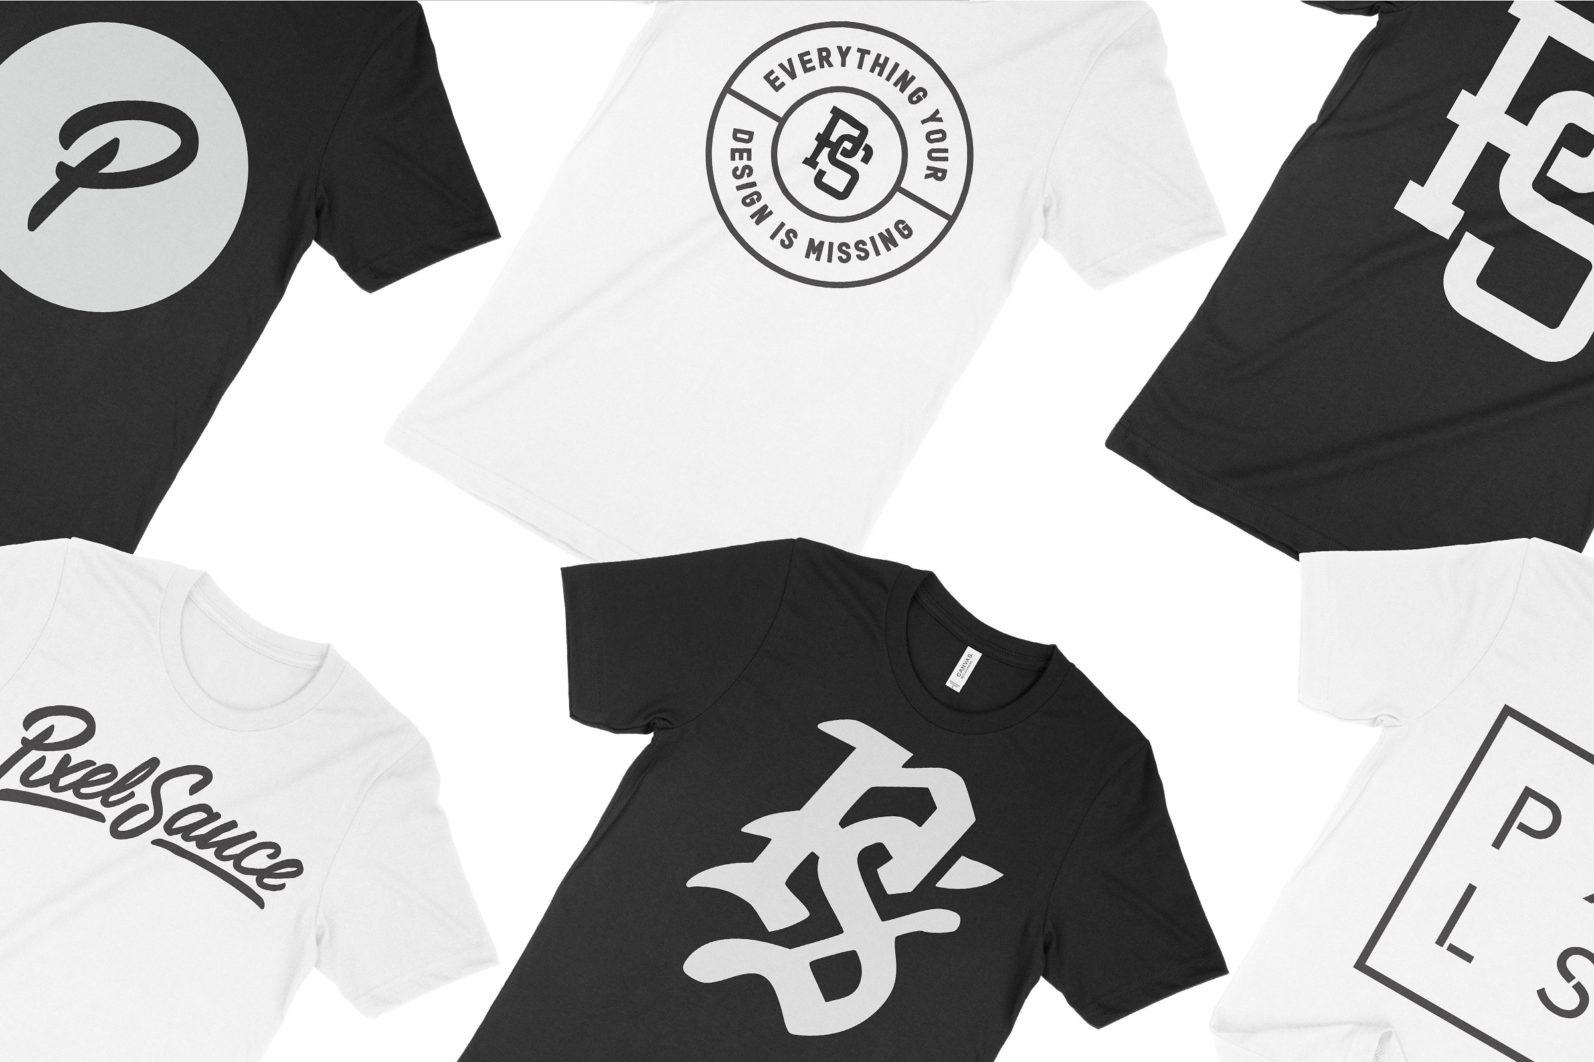 Bella Canvas 3001 T-Shirt Mockups - ps bc 3001 02 -